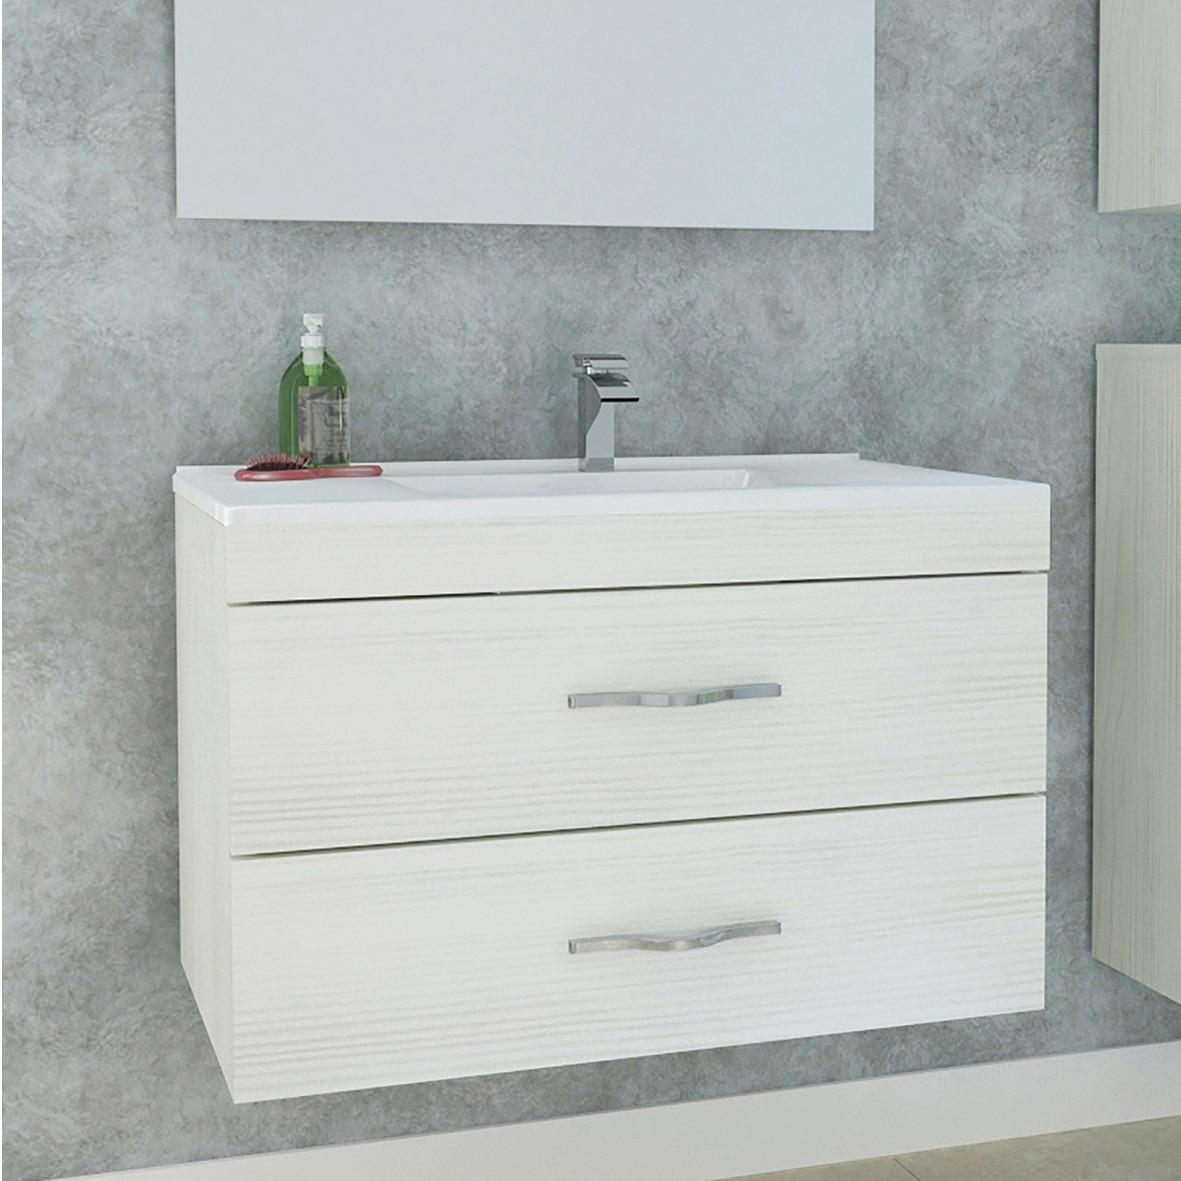 Fotografie Baza mobilier suspendat, cu doua sertare cu inchidere amortizata, Kring Corallo, 80x51x46cm